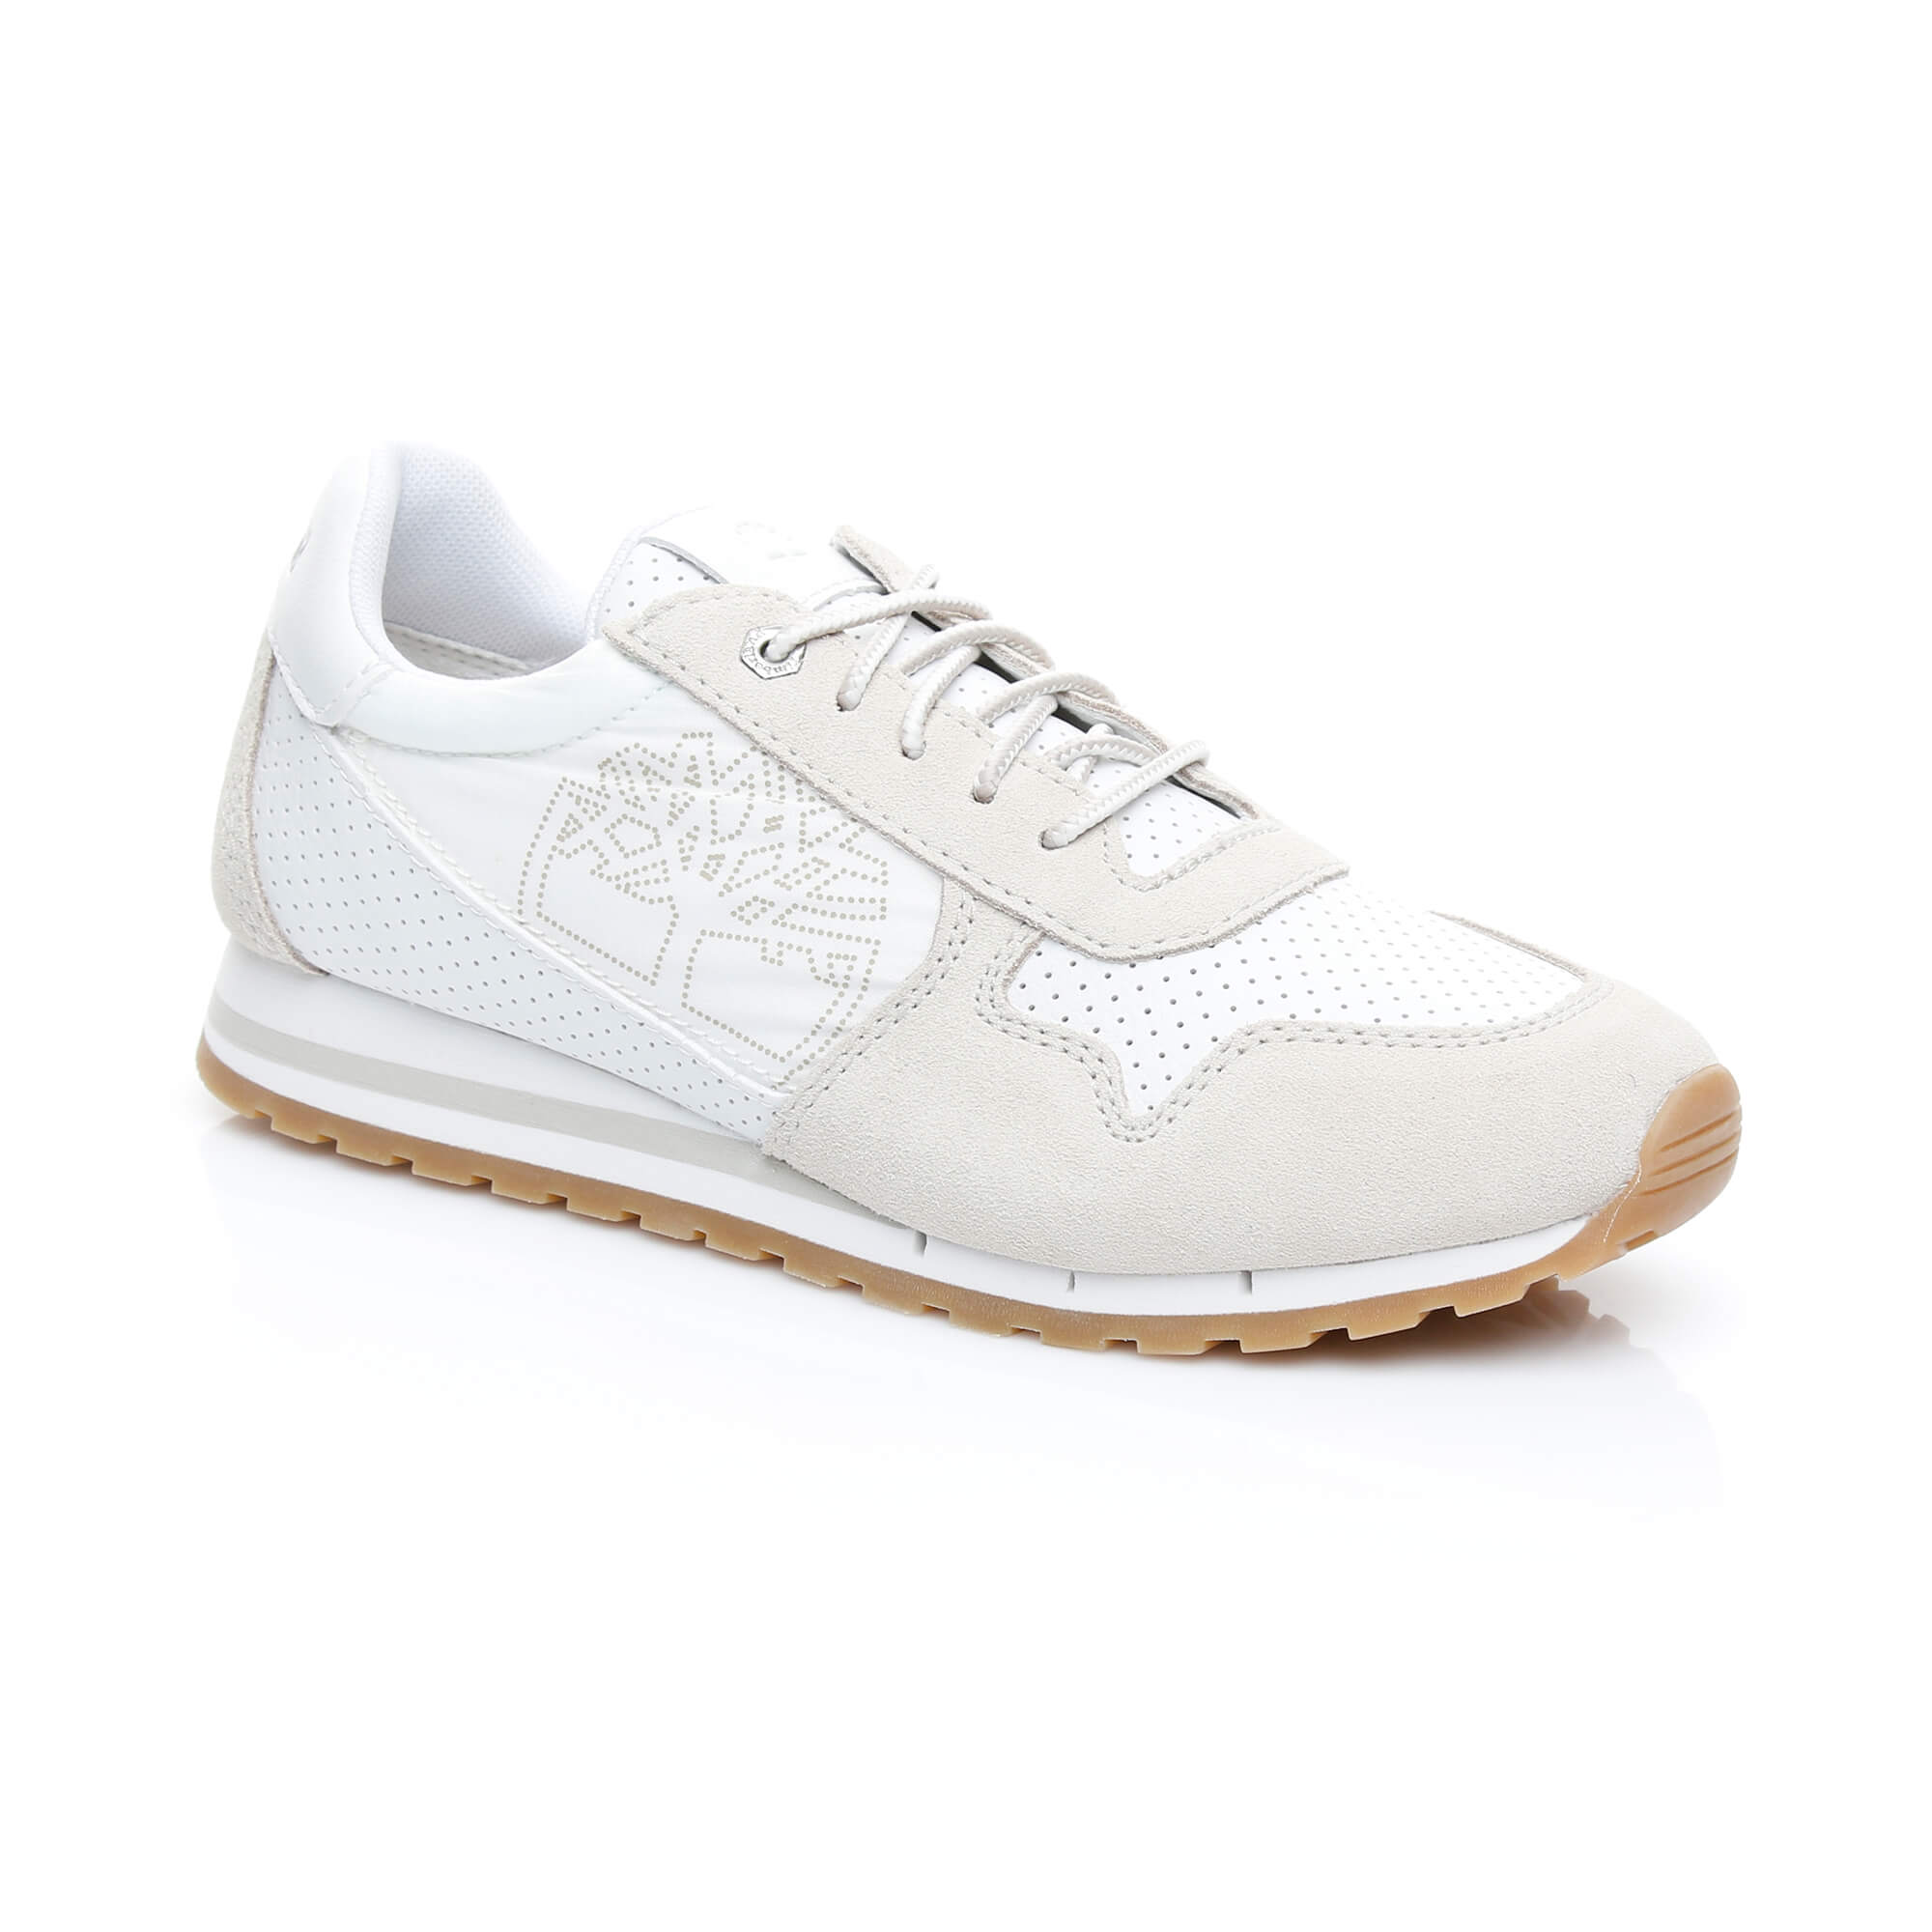 Timberland Milan Flavor Kadın Beyaz Sneakers